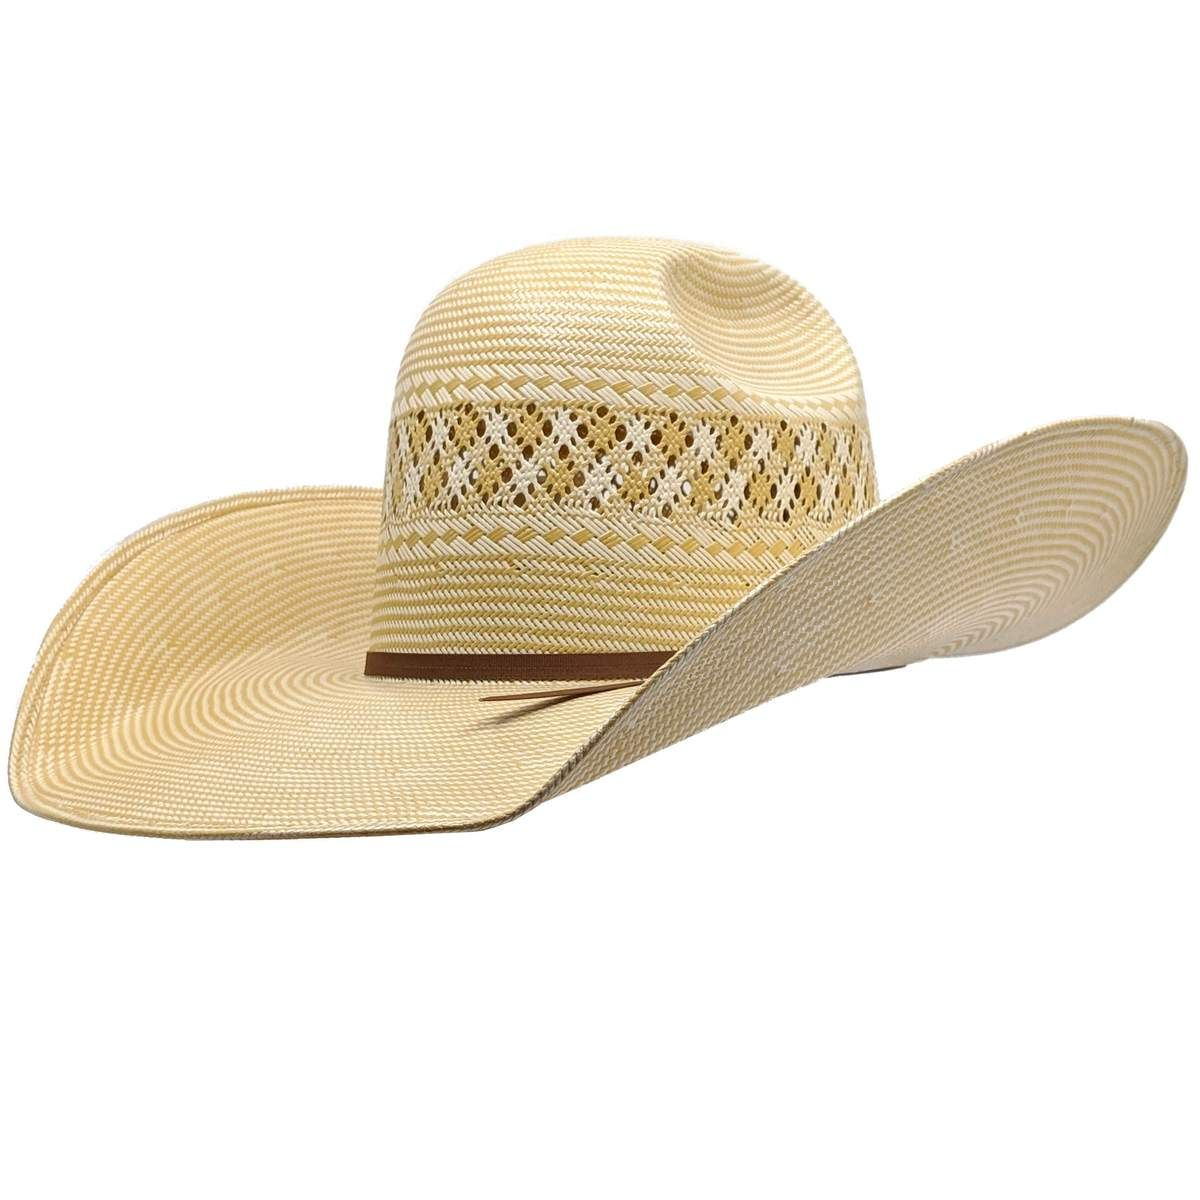 Twister Whiskey Two Cord Shantung Straw Hat 5 Cowboy Hats Mens Cowboy Hats Cowboy Outfits